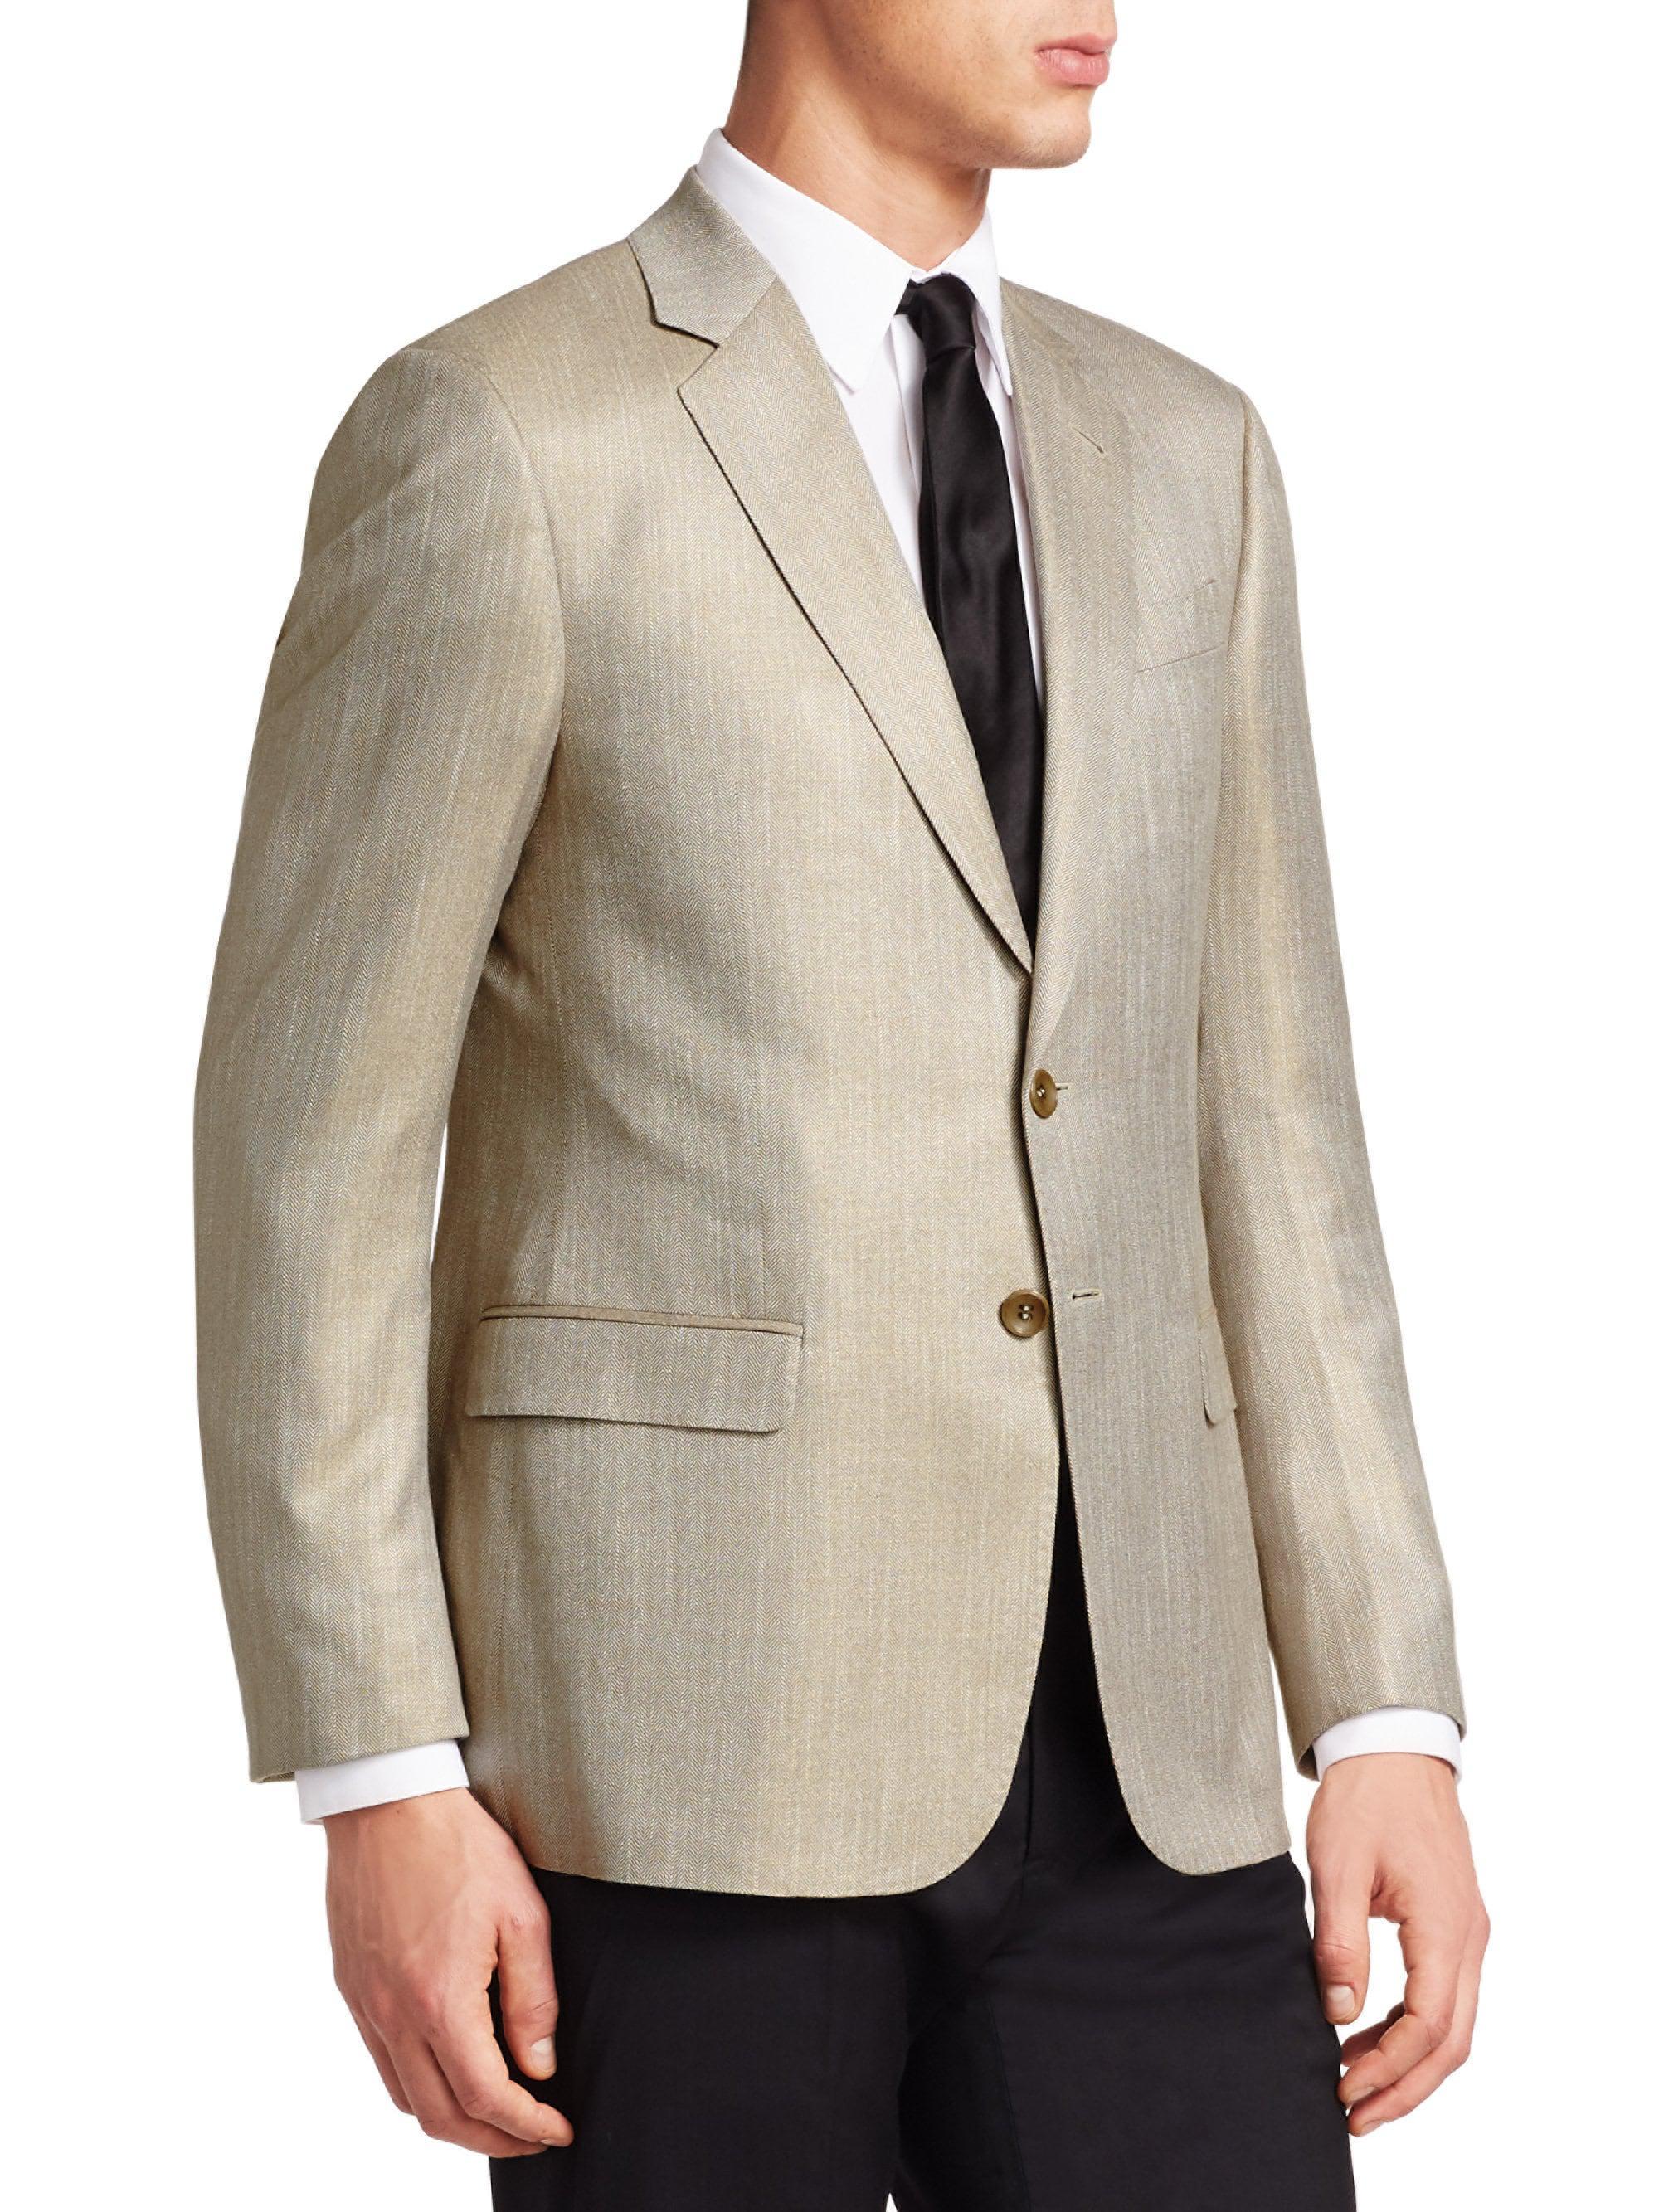 Chevron Giorgio For Lyst Wool Armani Sportcoat Men UPwwqOEx 2d191ec1c92